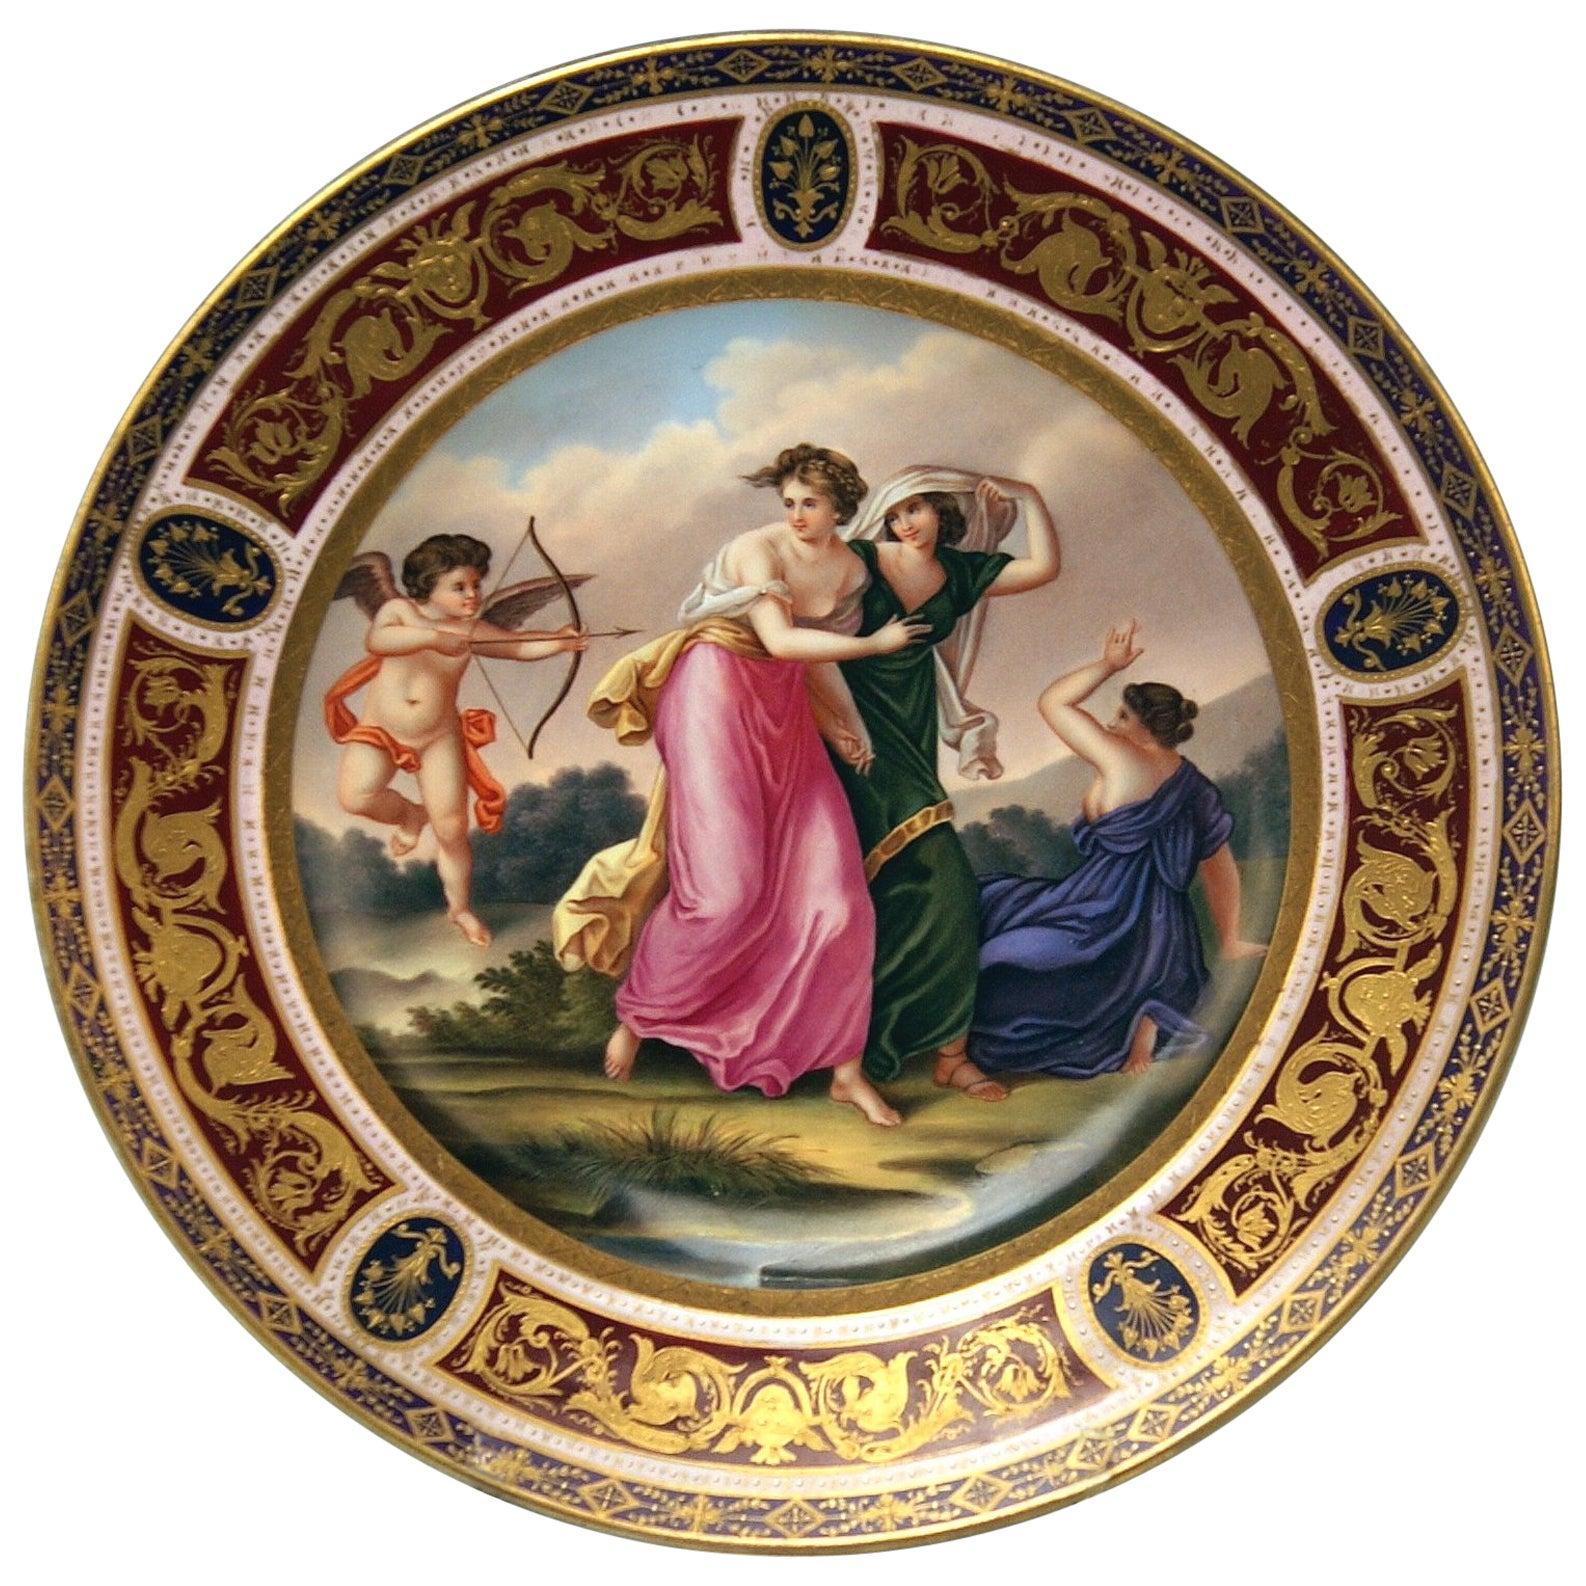 Plate Imperial Viennese Porcelain 1802 Amor Cherub Nymphs Angelika Kauffmann